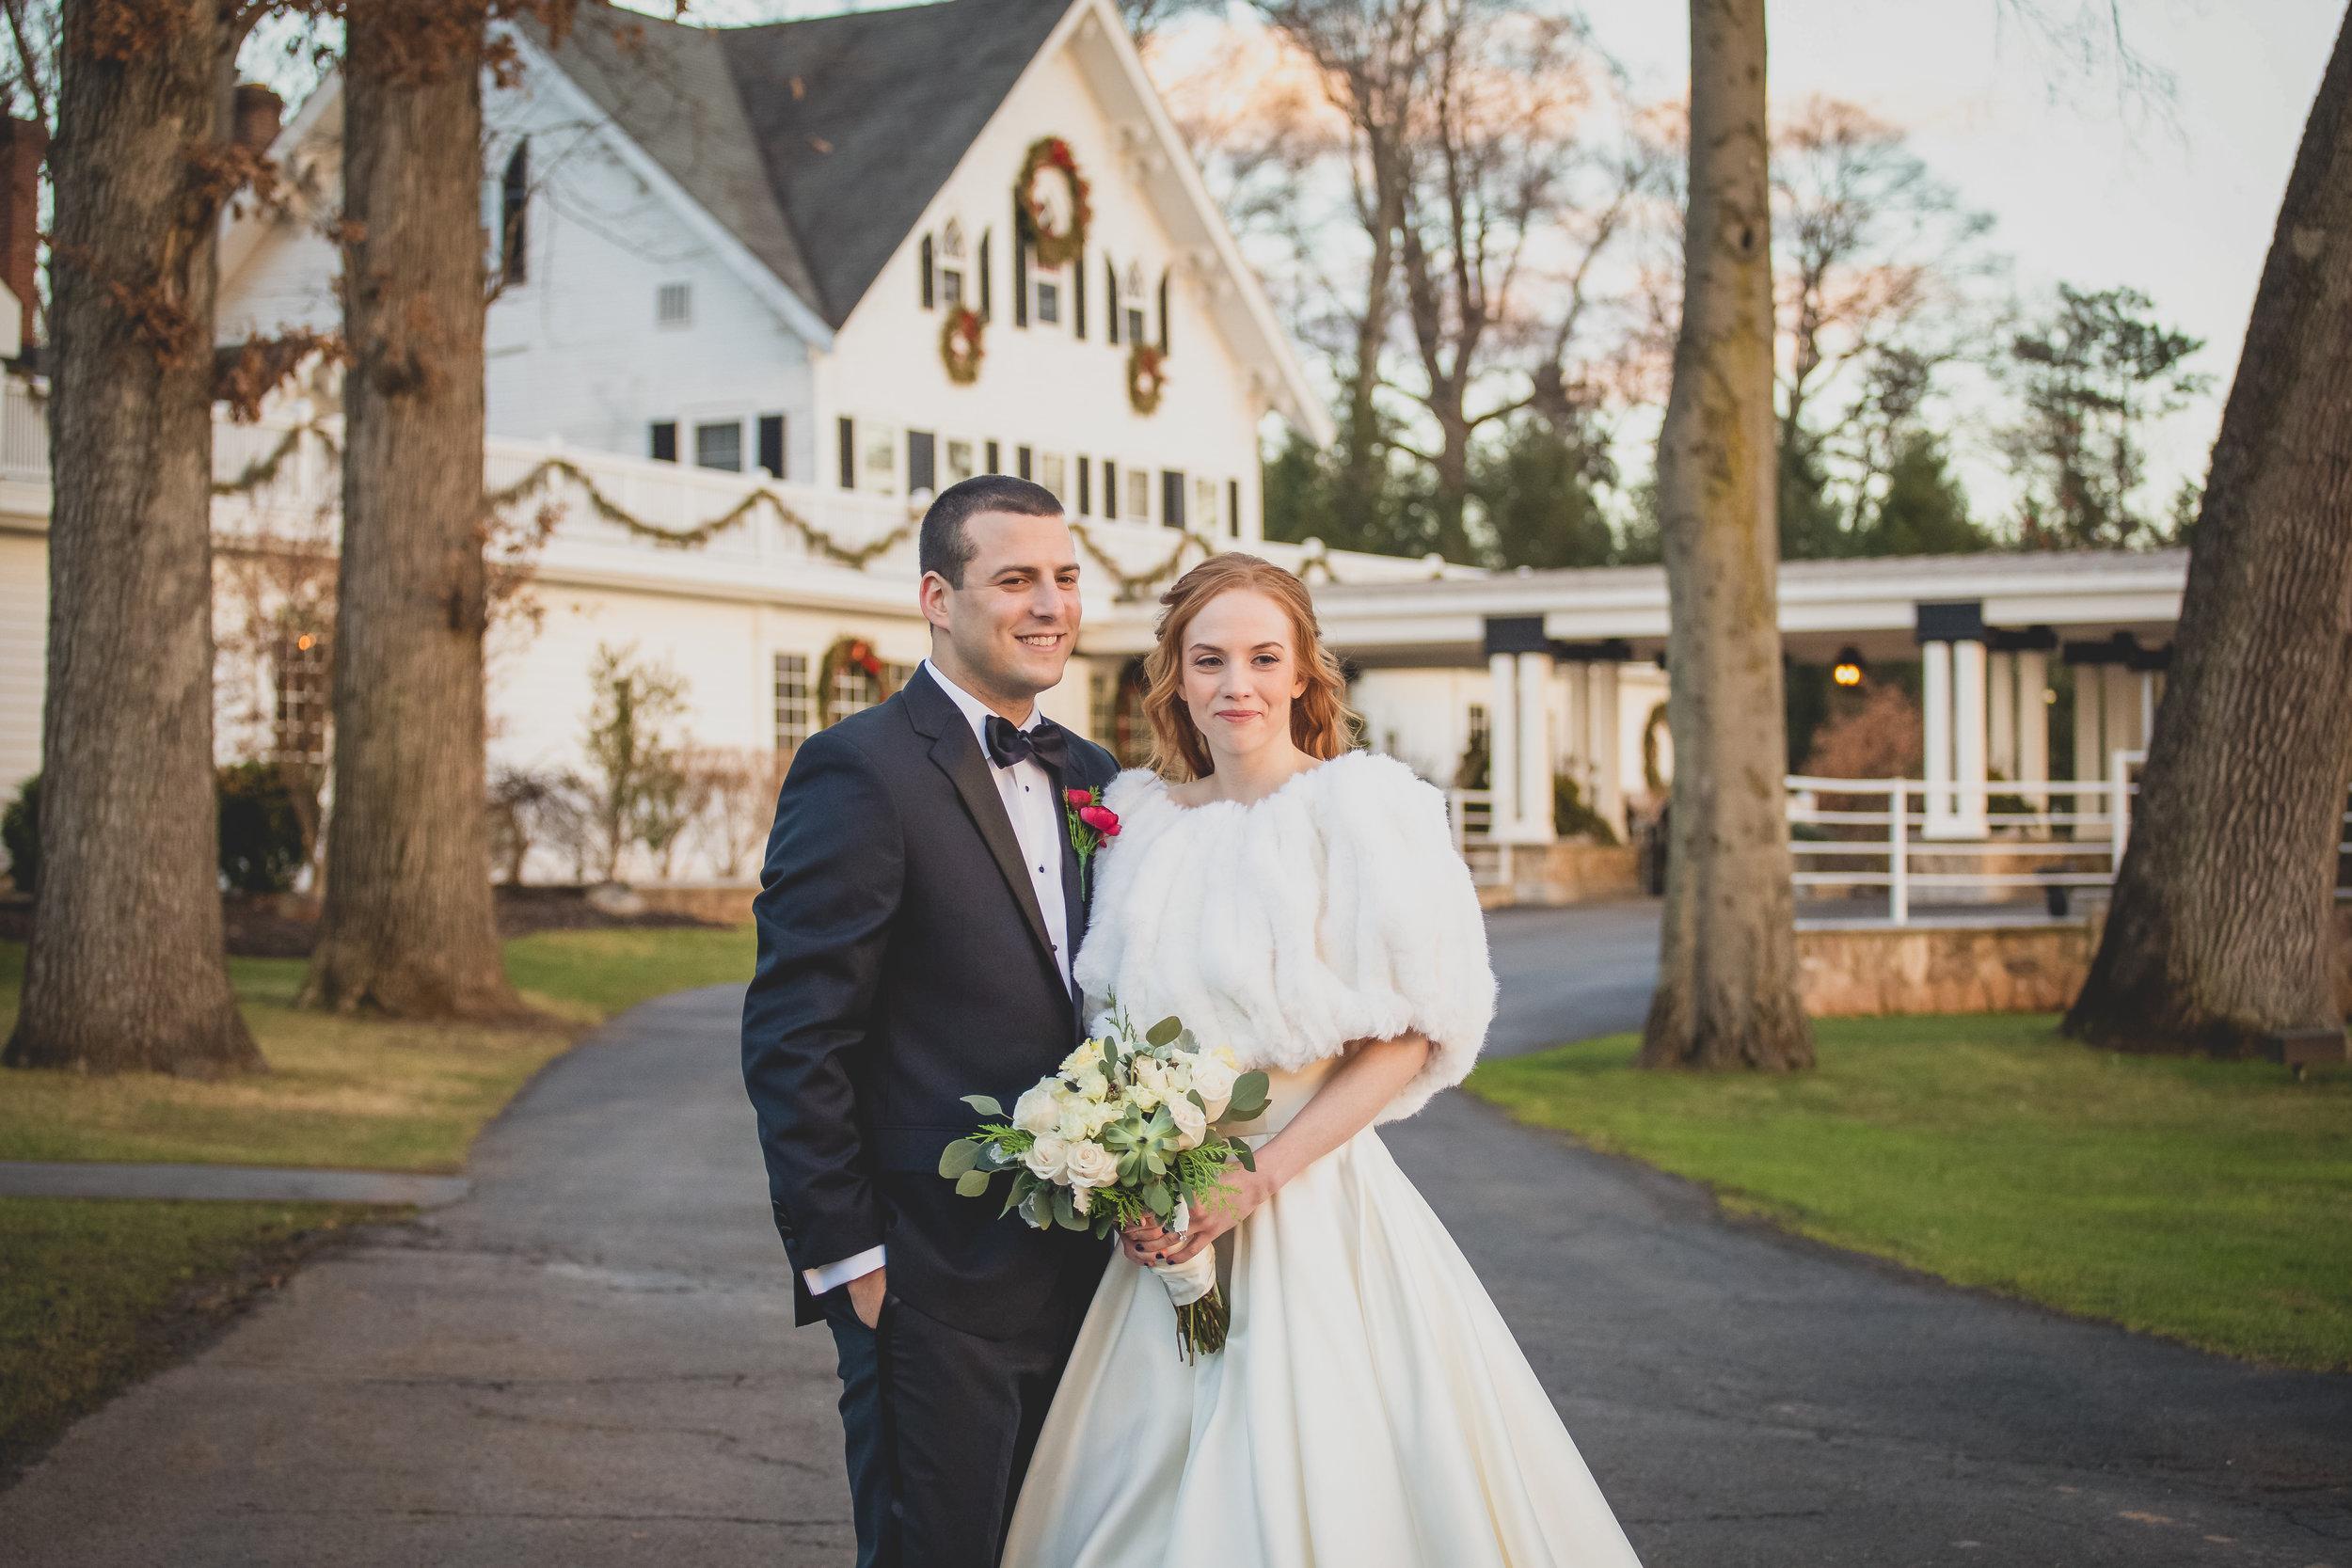 Whitehouse Station, NJ Wedding Venue - The Ryland Inn - Couples Photoshoot with Flowers